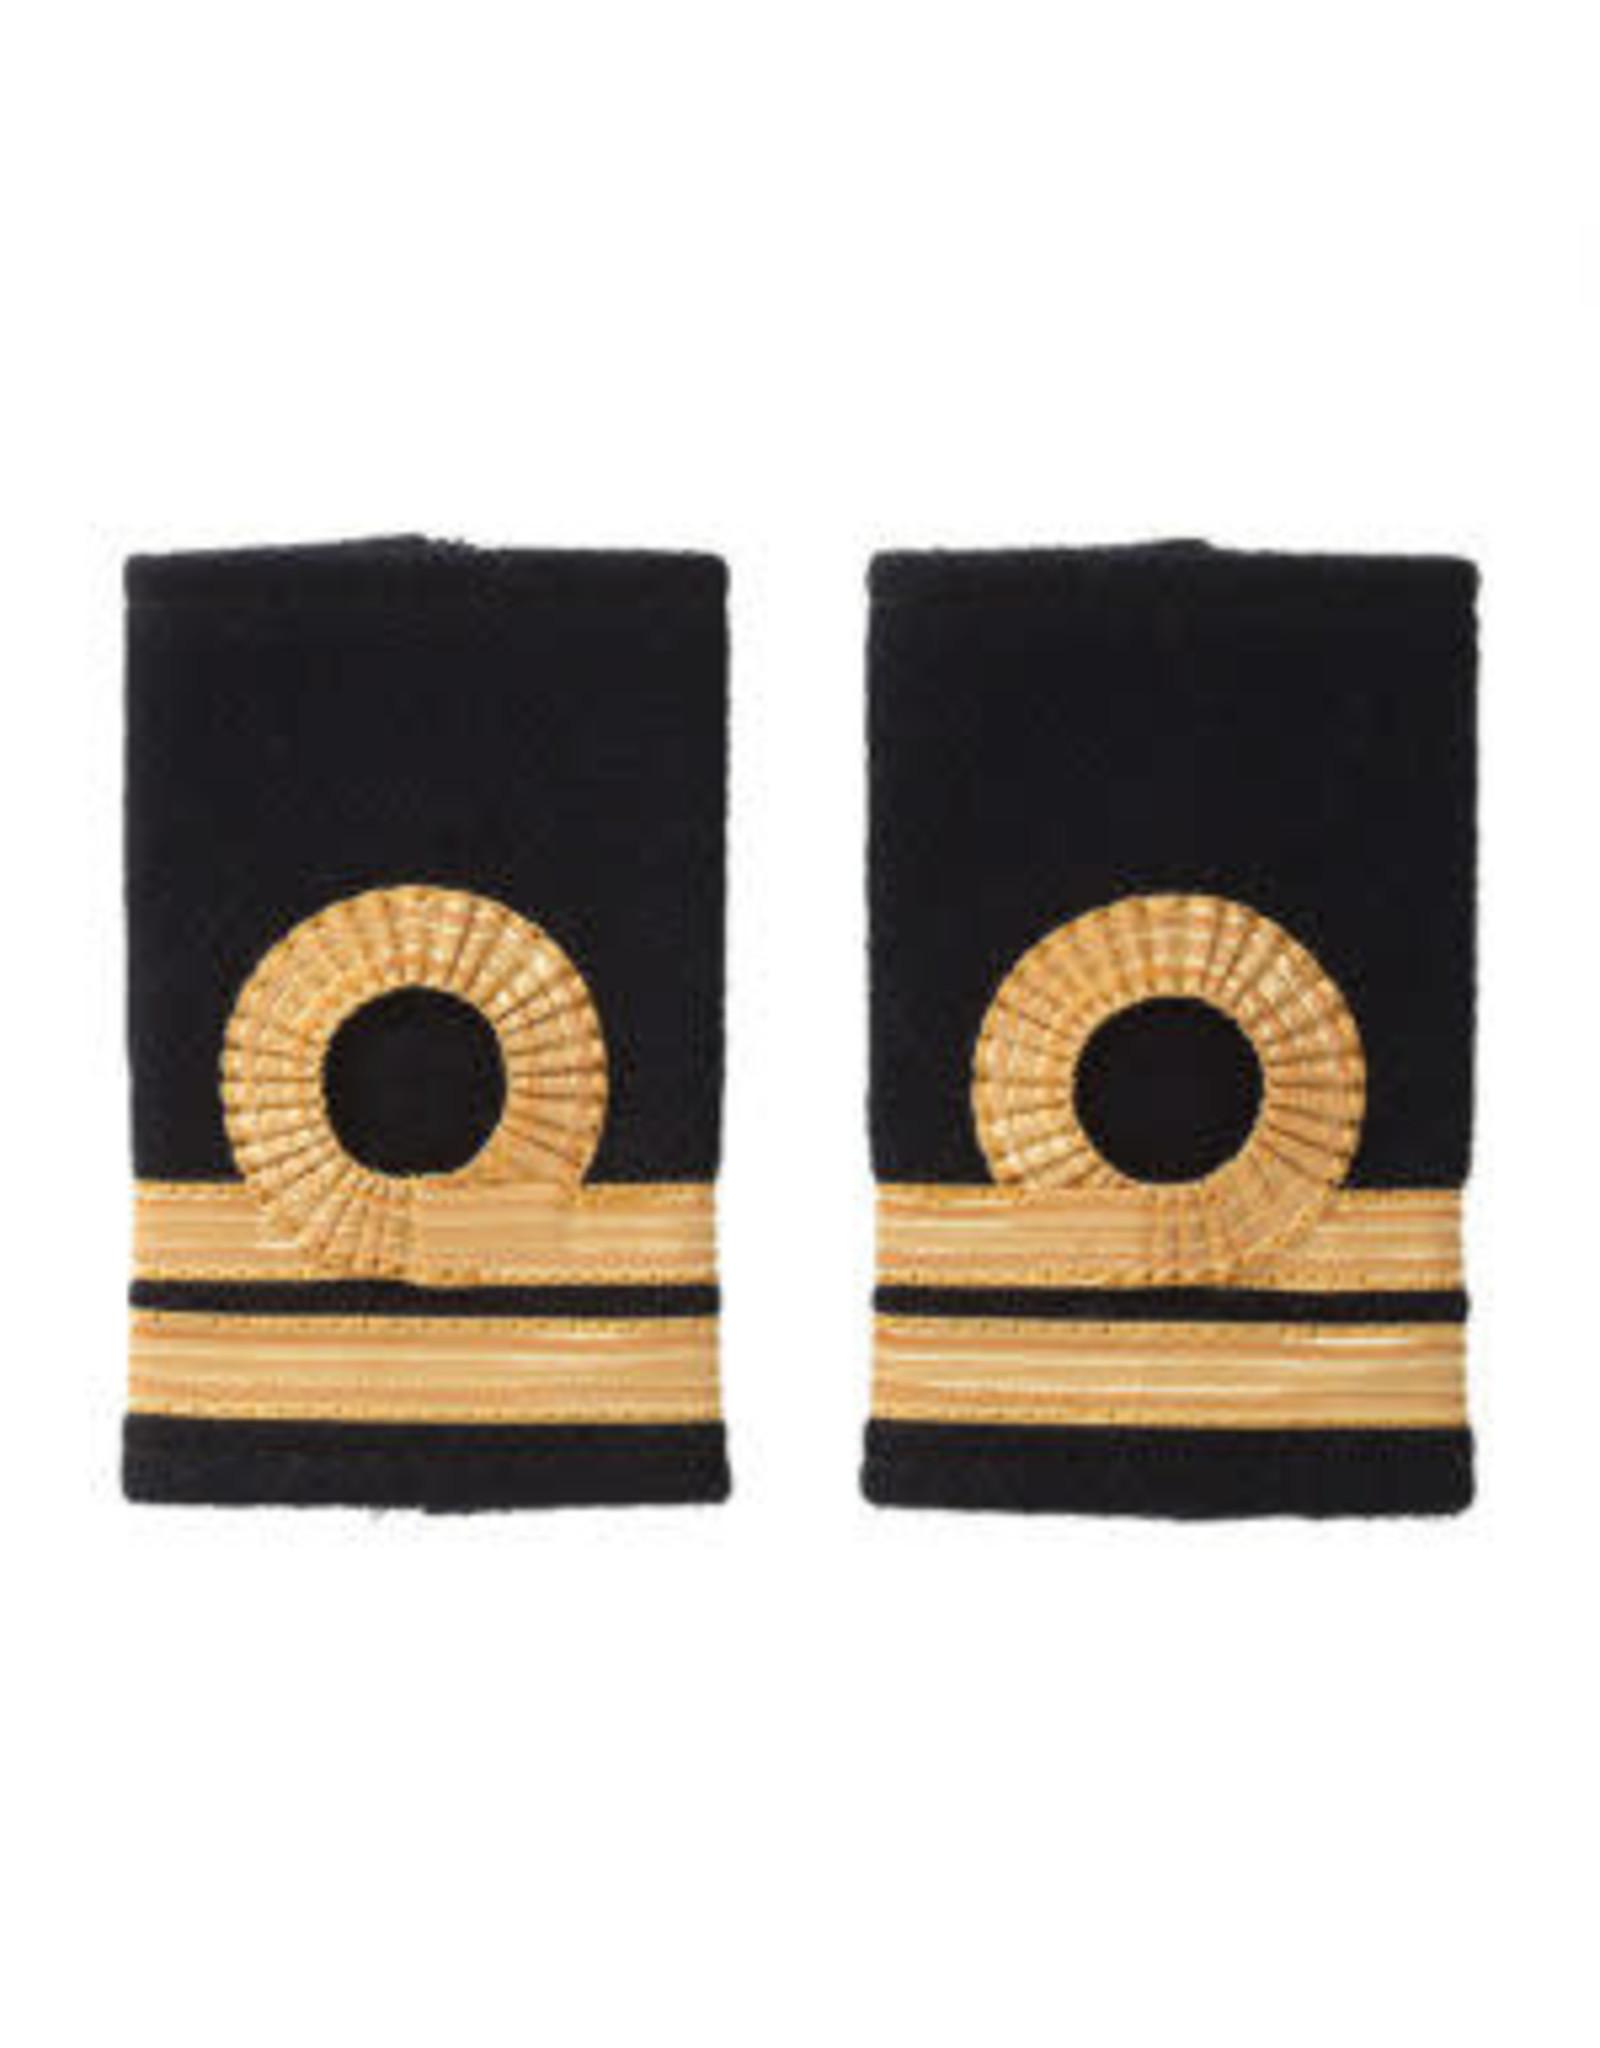 Passant Officier Nelson + 1 streep (2)